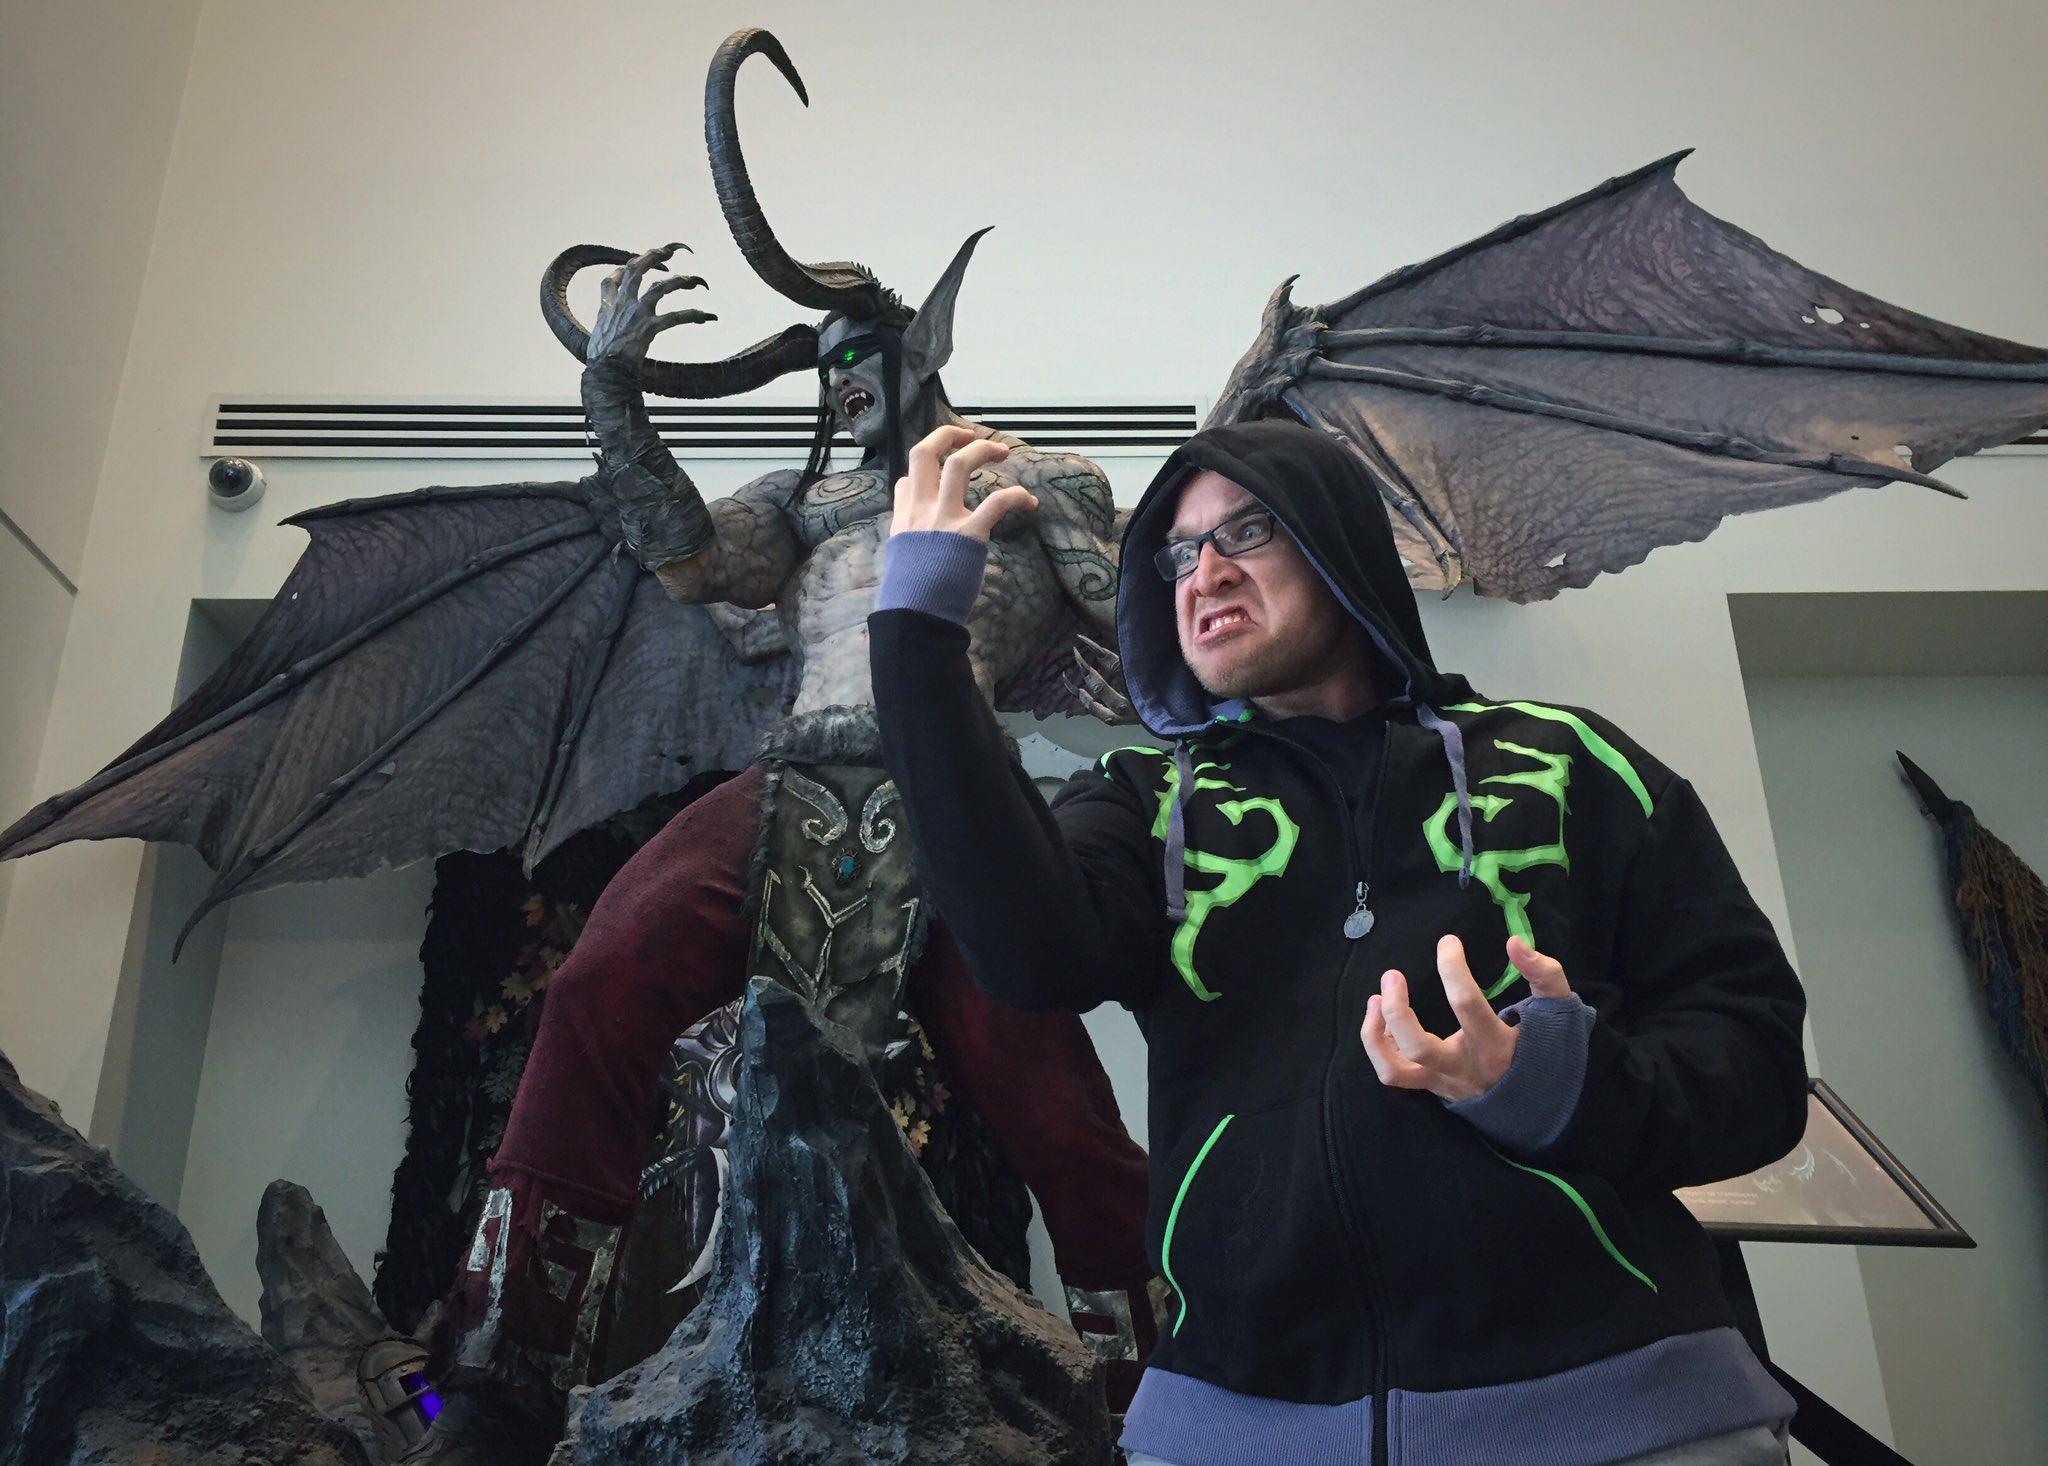 Blizzard Ent on Twitter